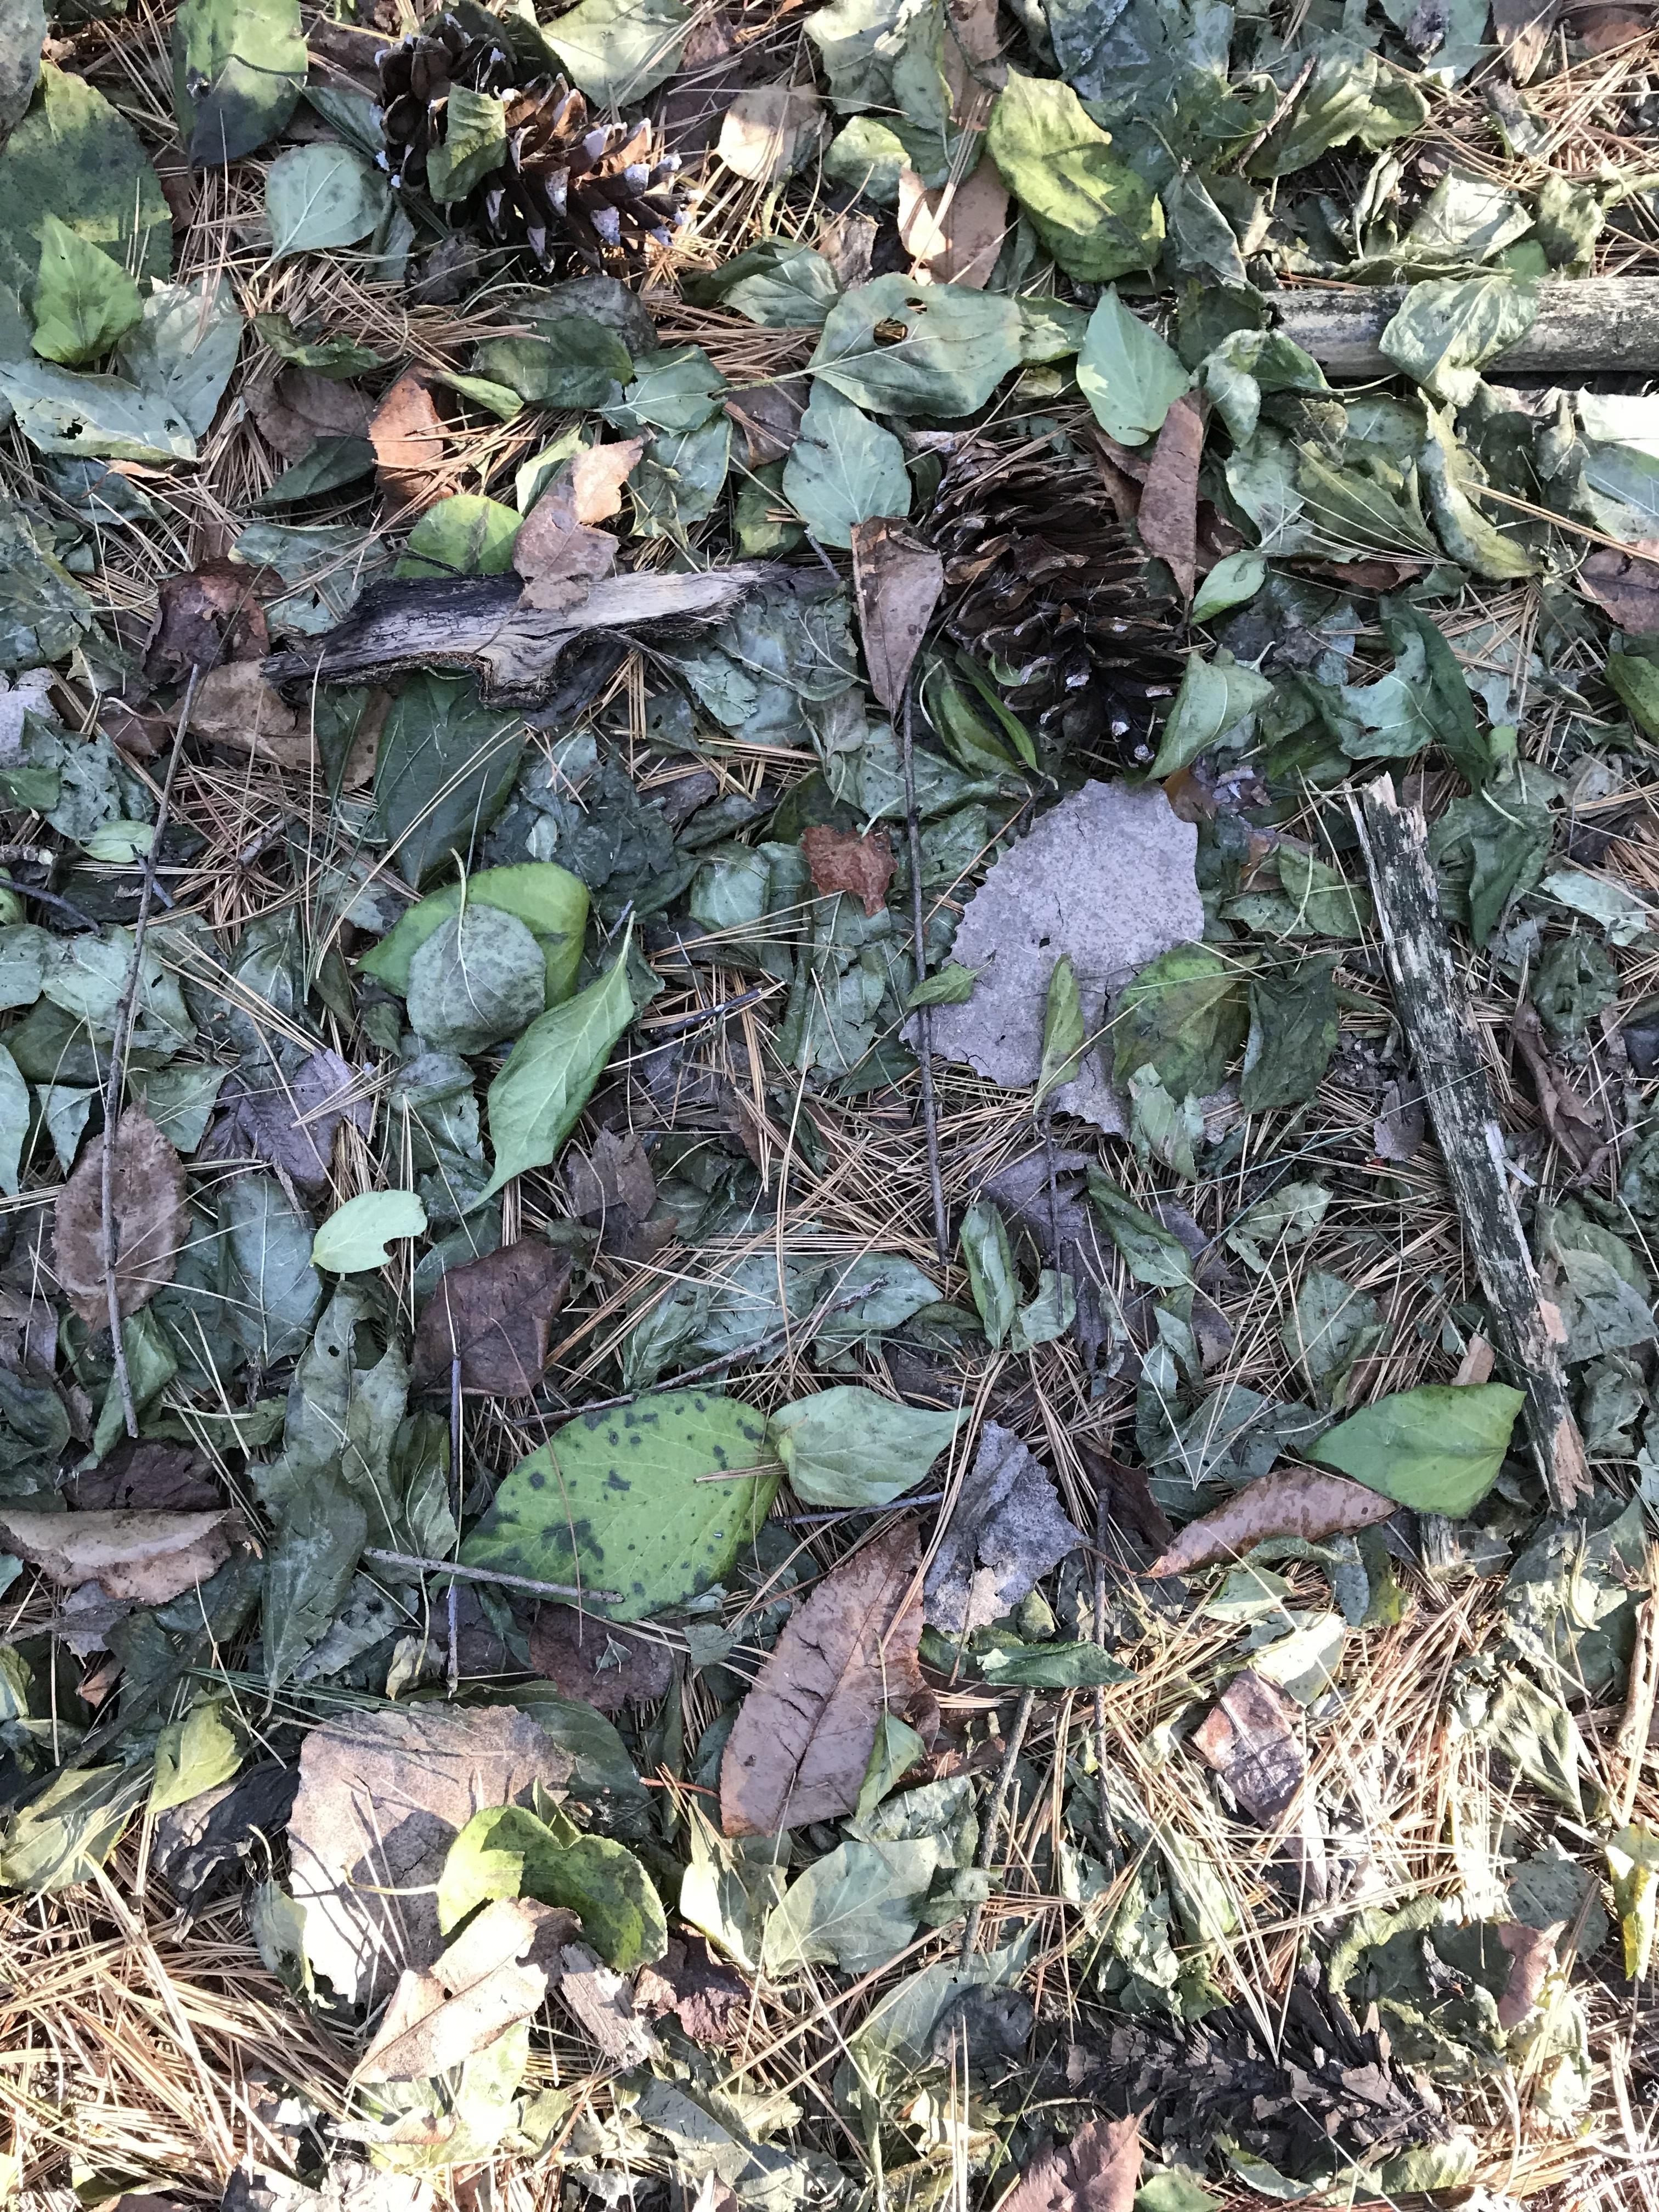 leavesongroundpic